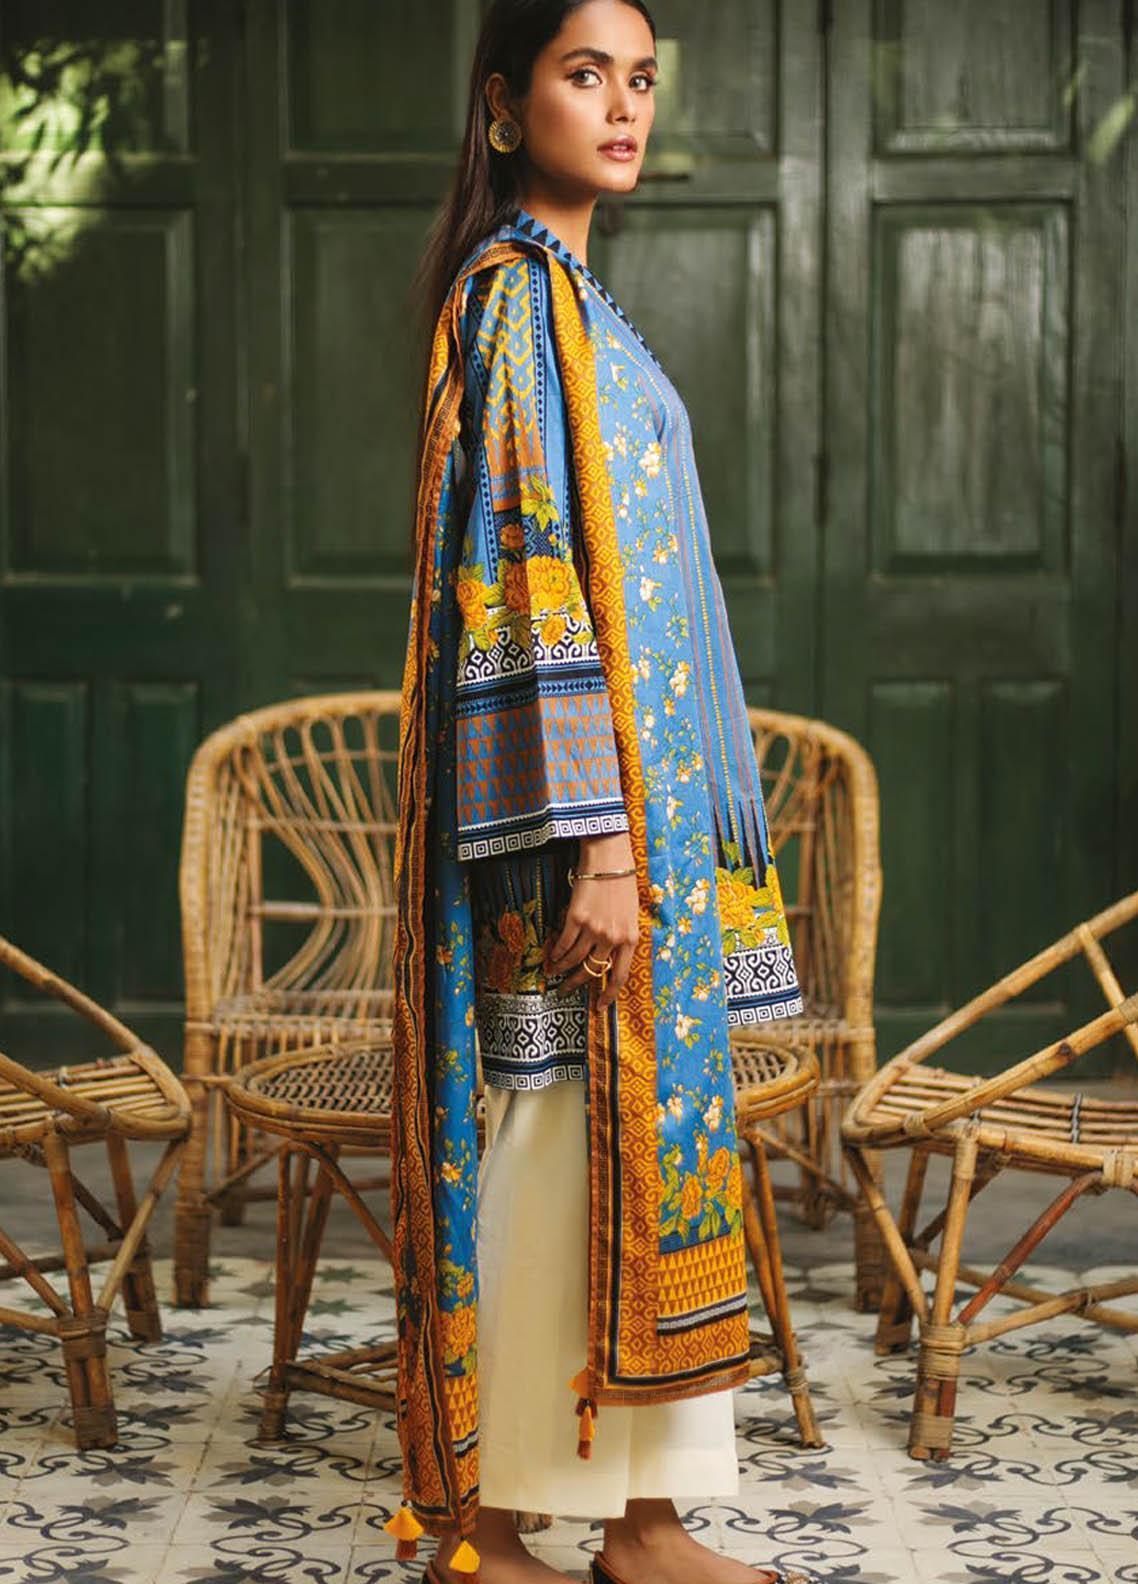 Orient Textile Printed Lawn Suits Unstitched 2 Piece OTL-21-024 Blue - Summer Collection